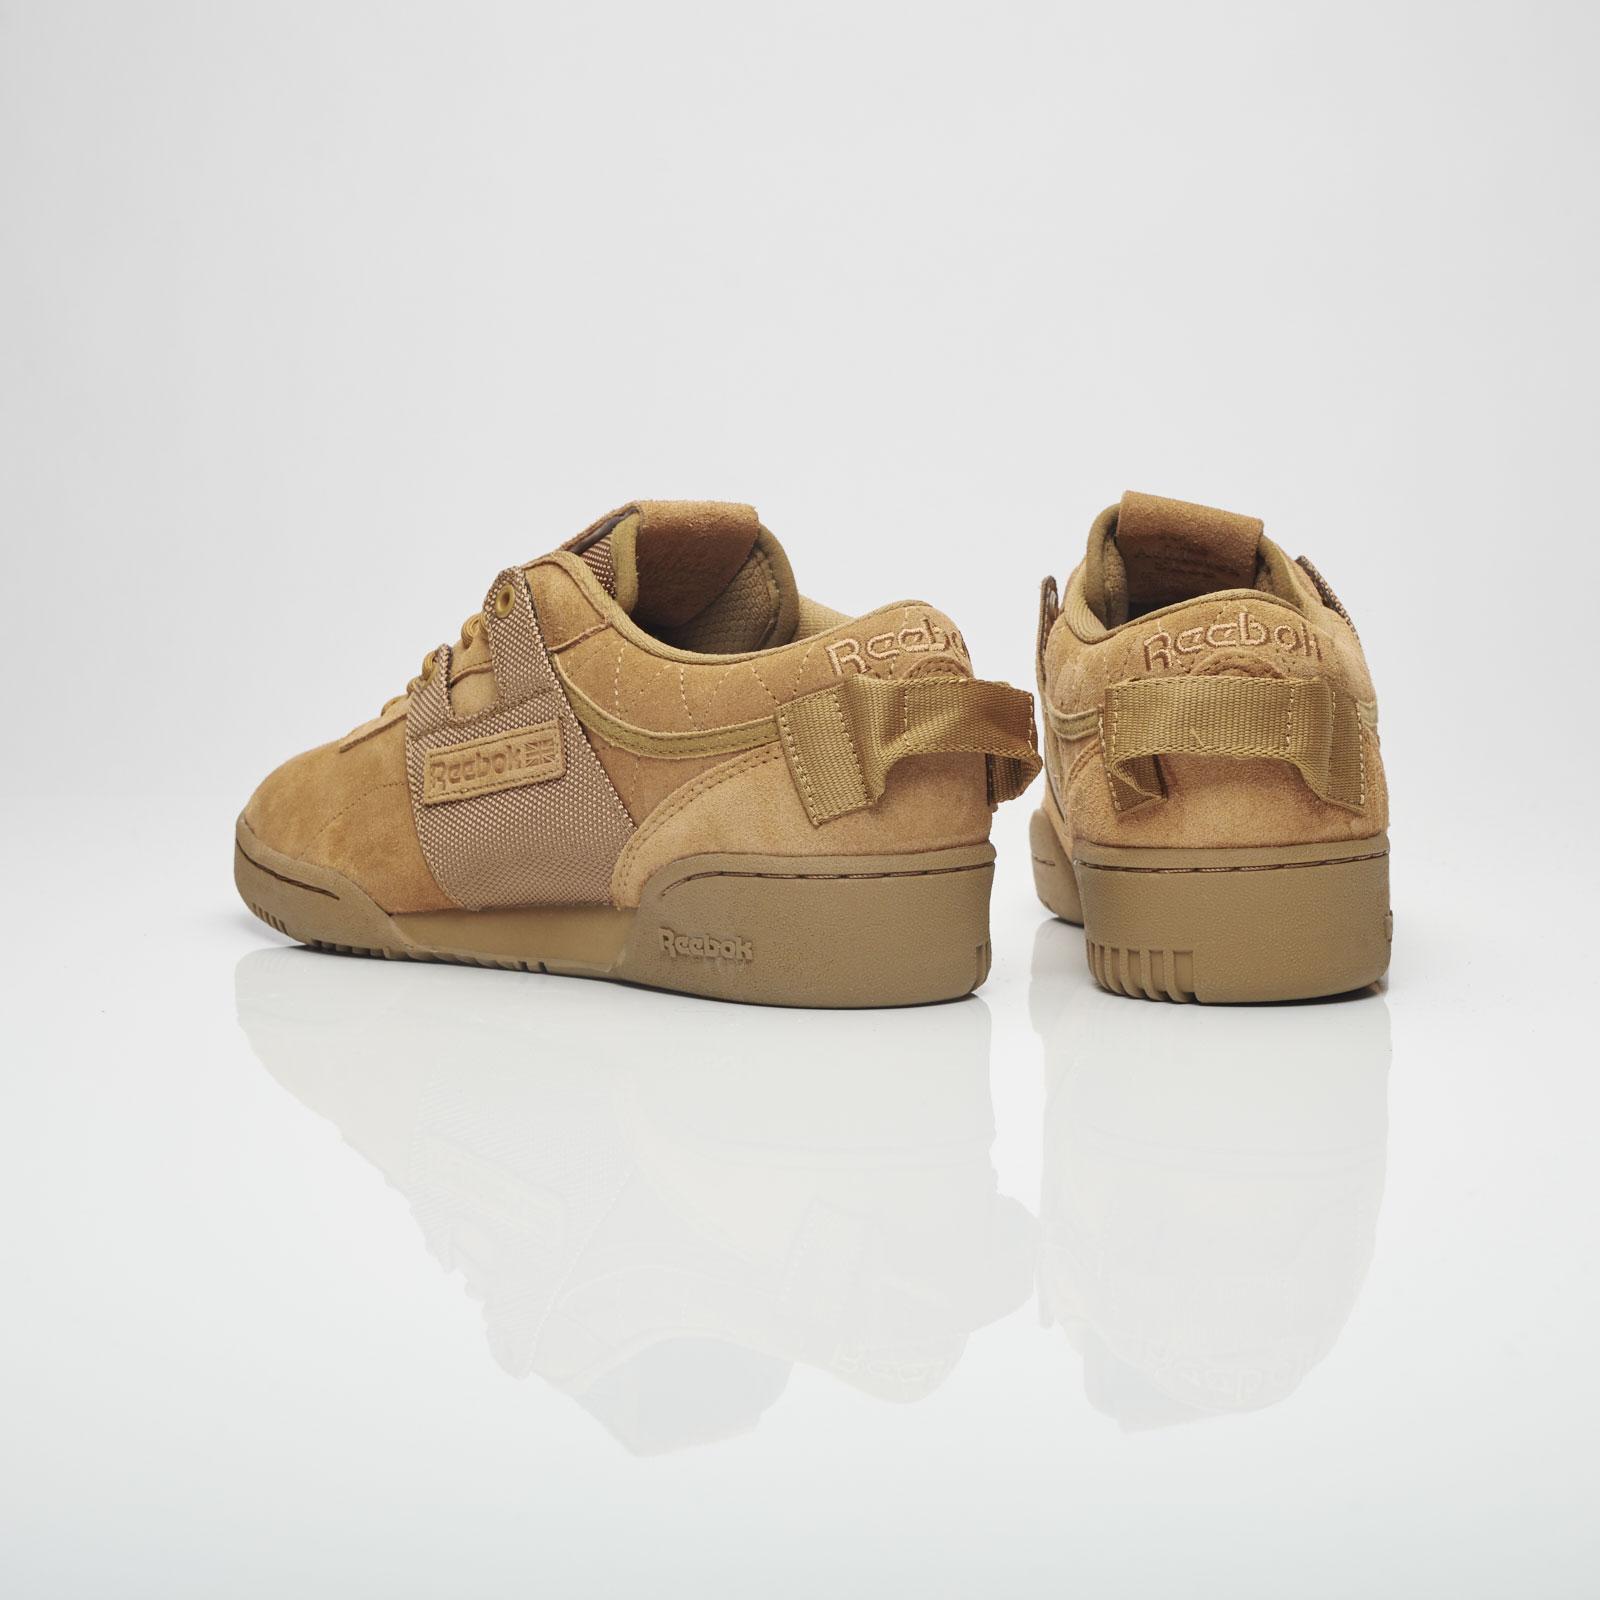 Reebok Workout Lo Clean Bs7772 Sneakersnstuff joggesko  sneakers